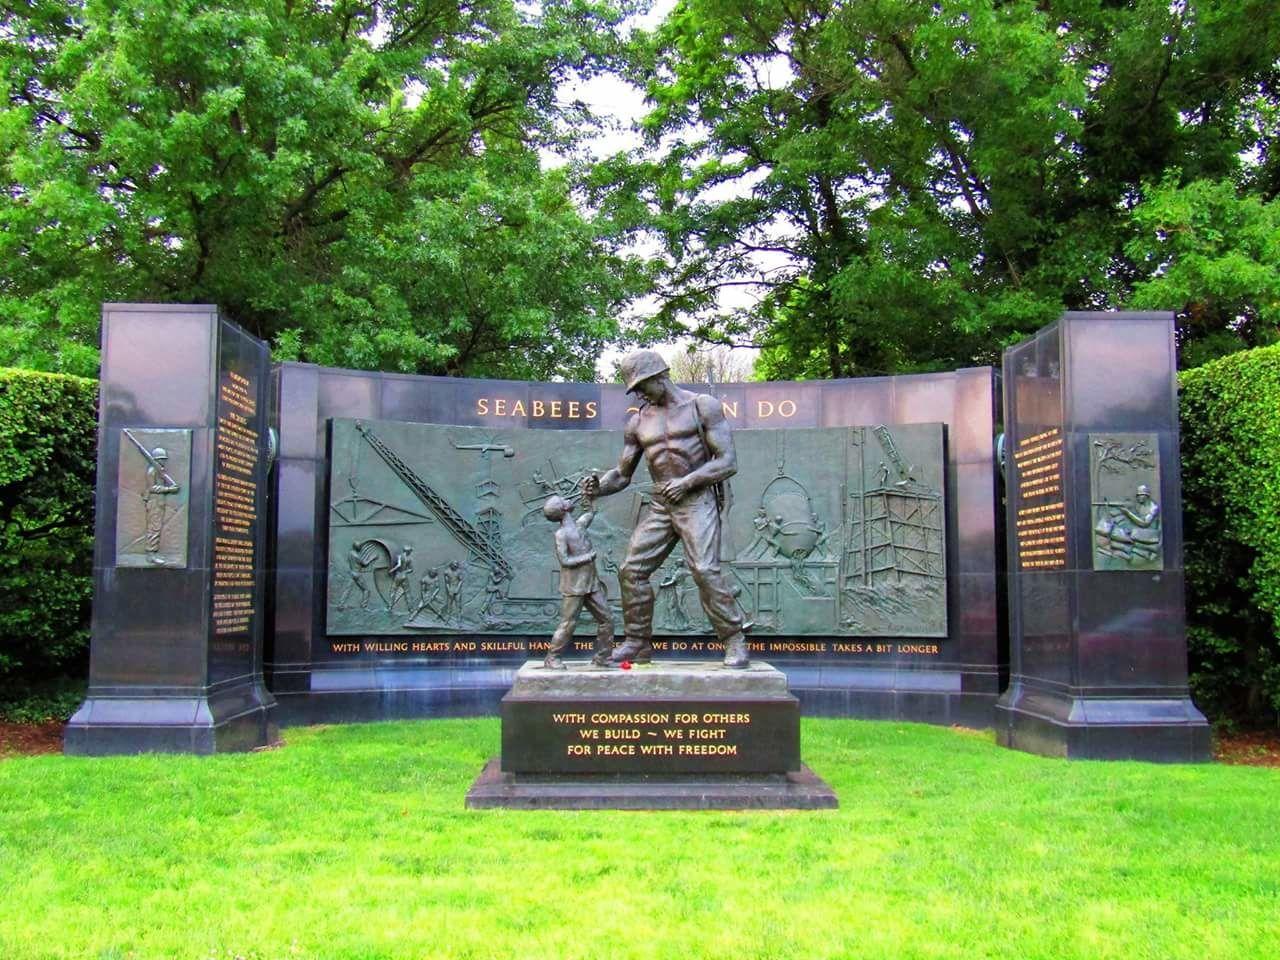 Seabees Seabee History Memorial Washington, D. C. USA This Week On Eyeem Cannon Powershot SX420 IS BestofEyeEm Best Of EyeEm No People Monument Memorial Day Remember The Fallen